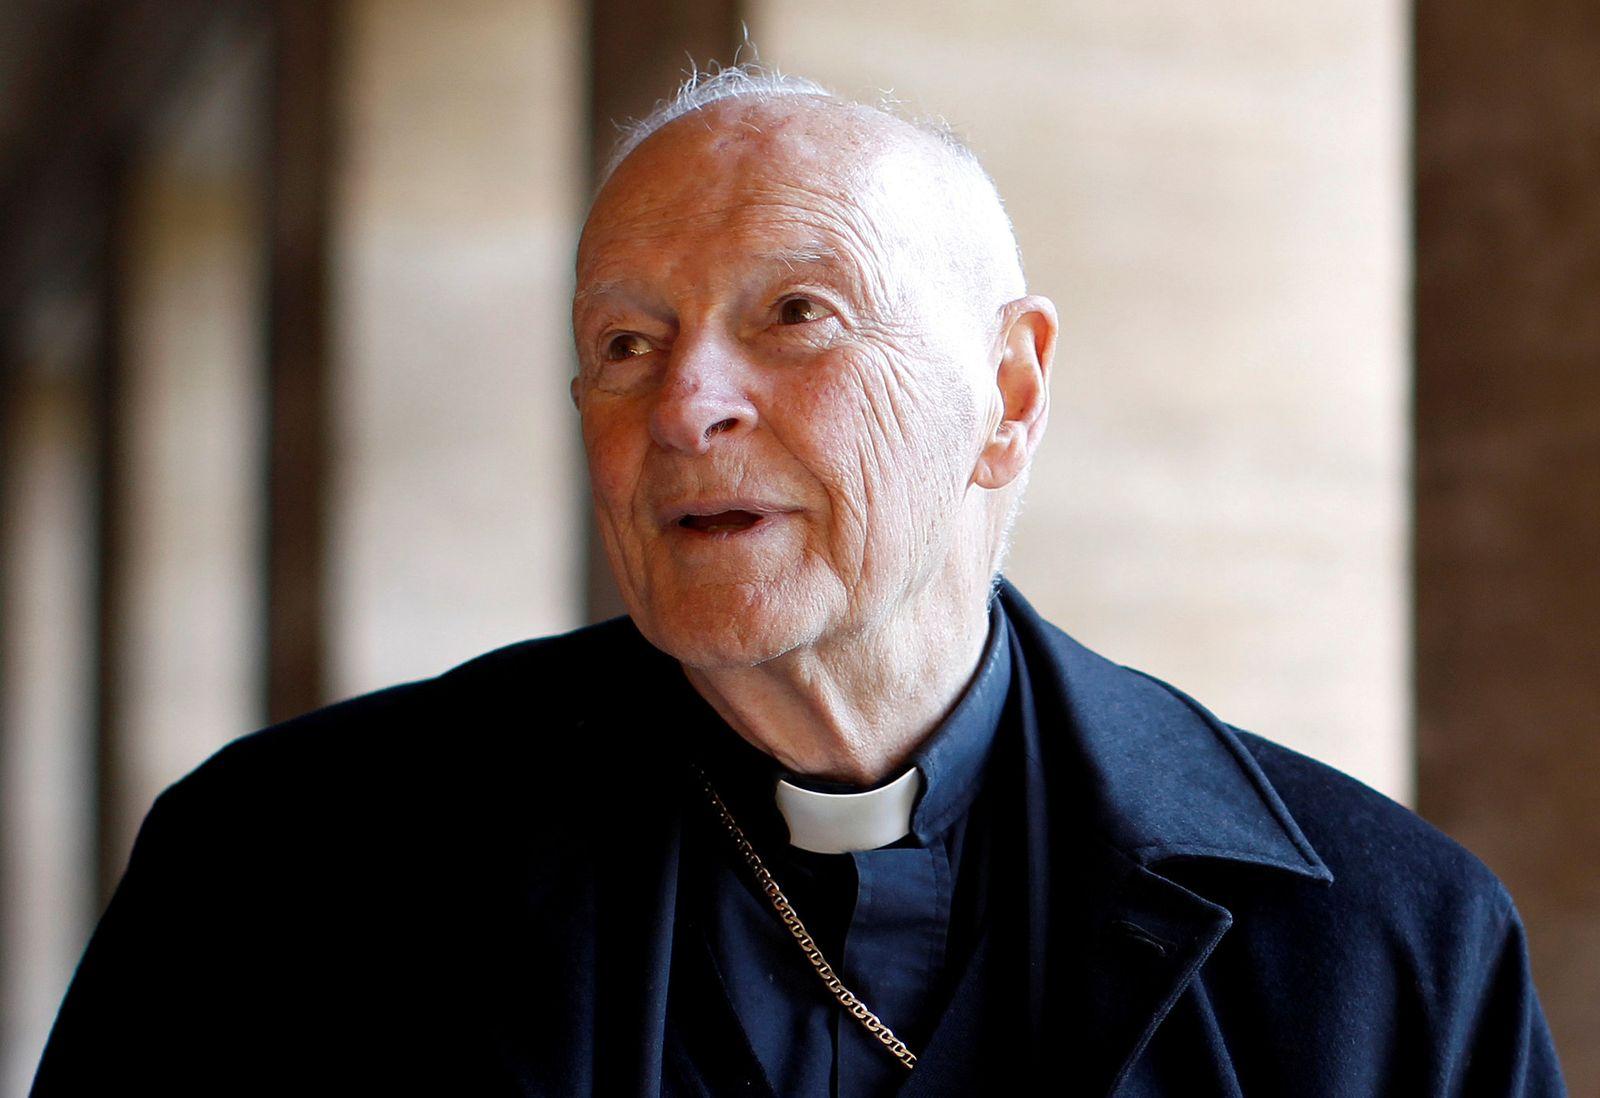 POPE-ABUSE/MCCARRICK